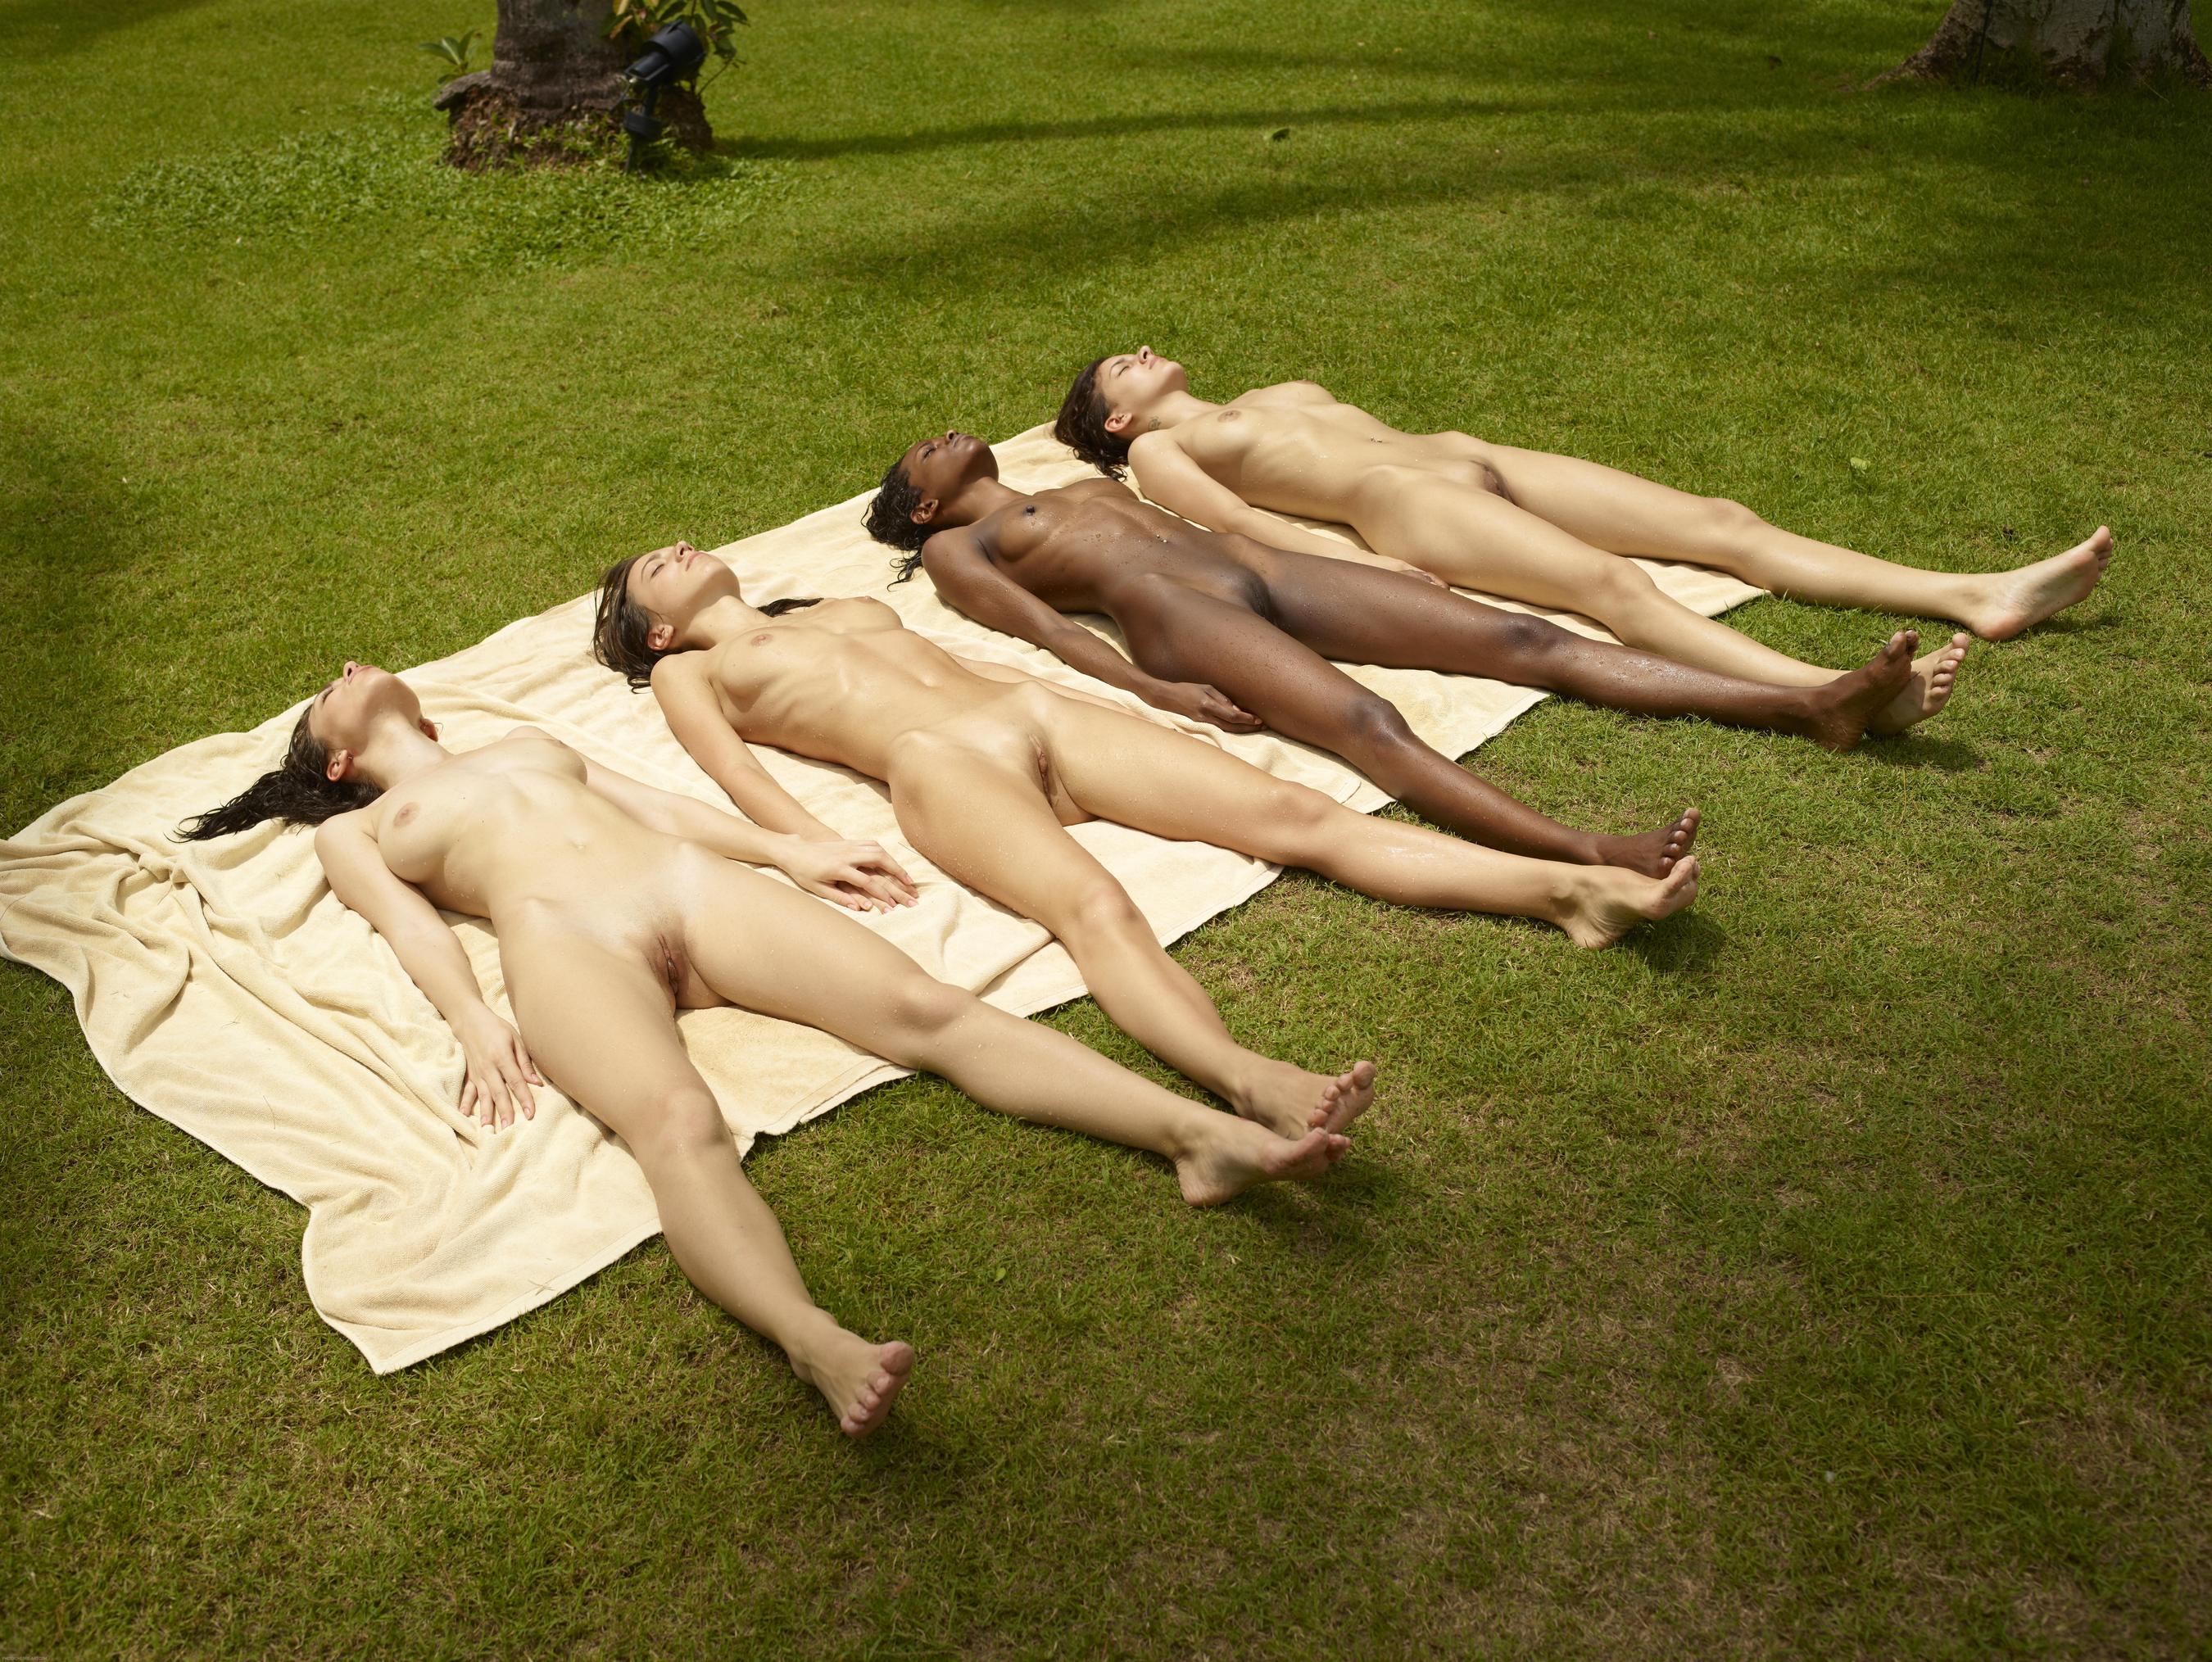 girls doing a split on a dick sex